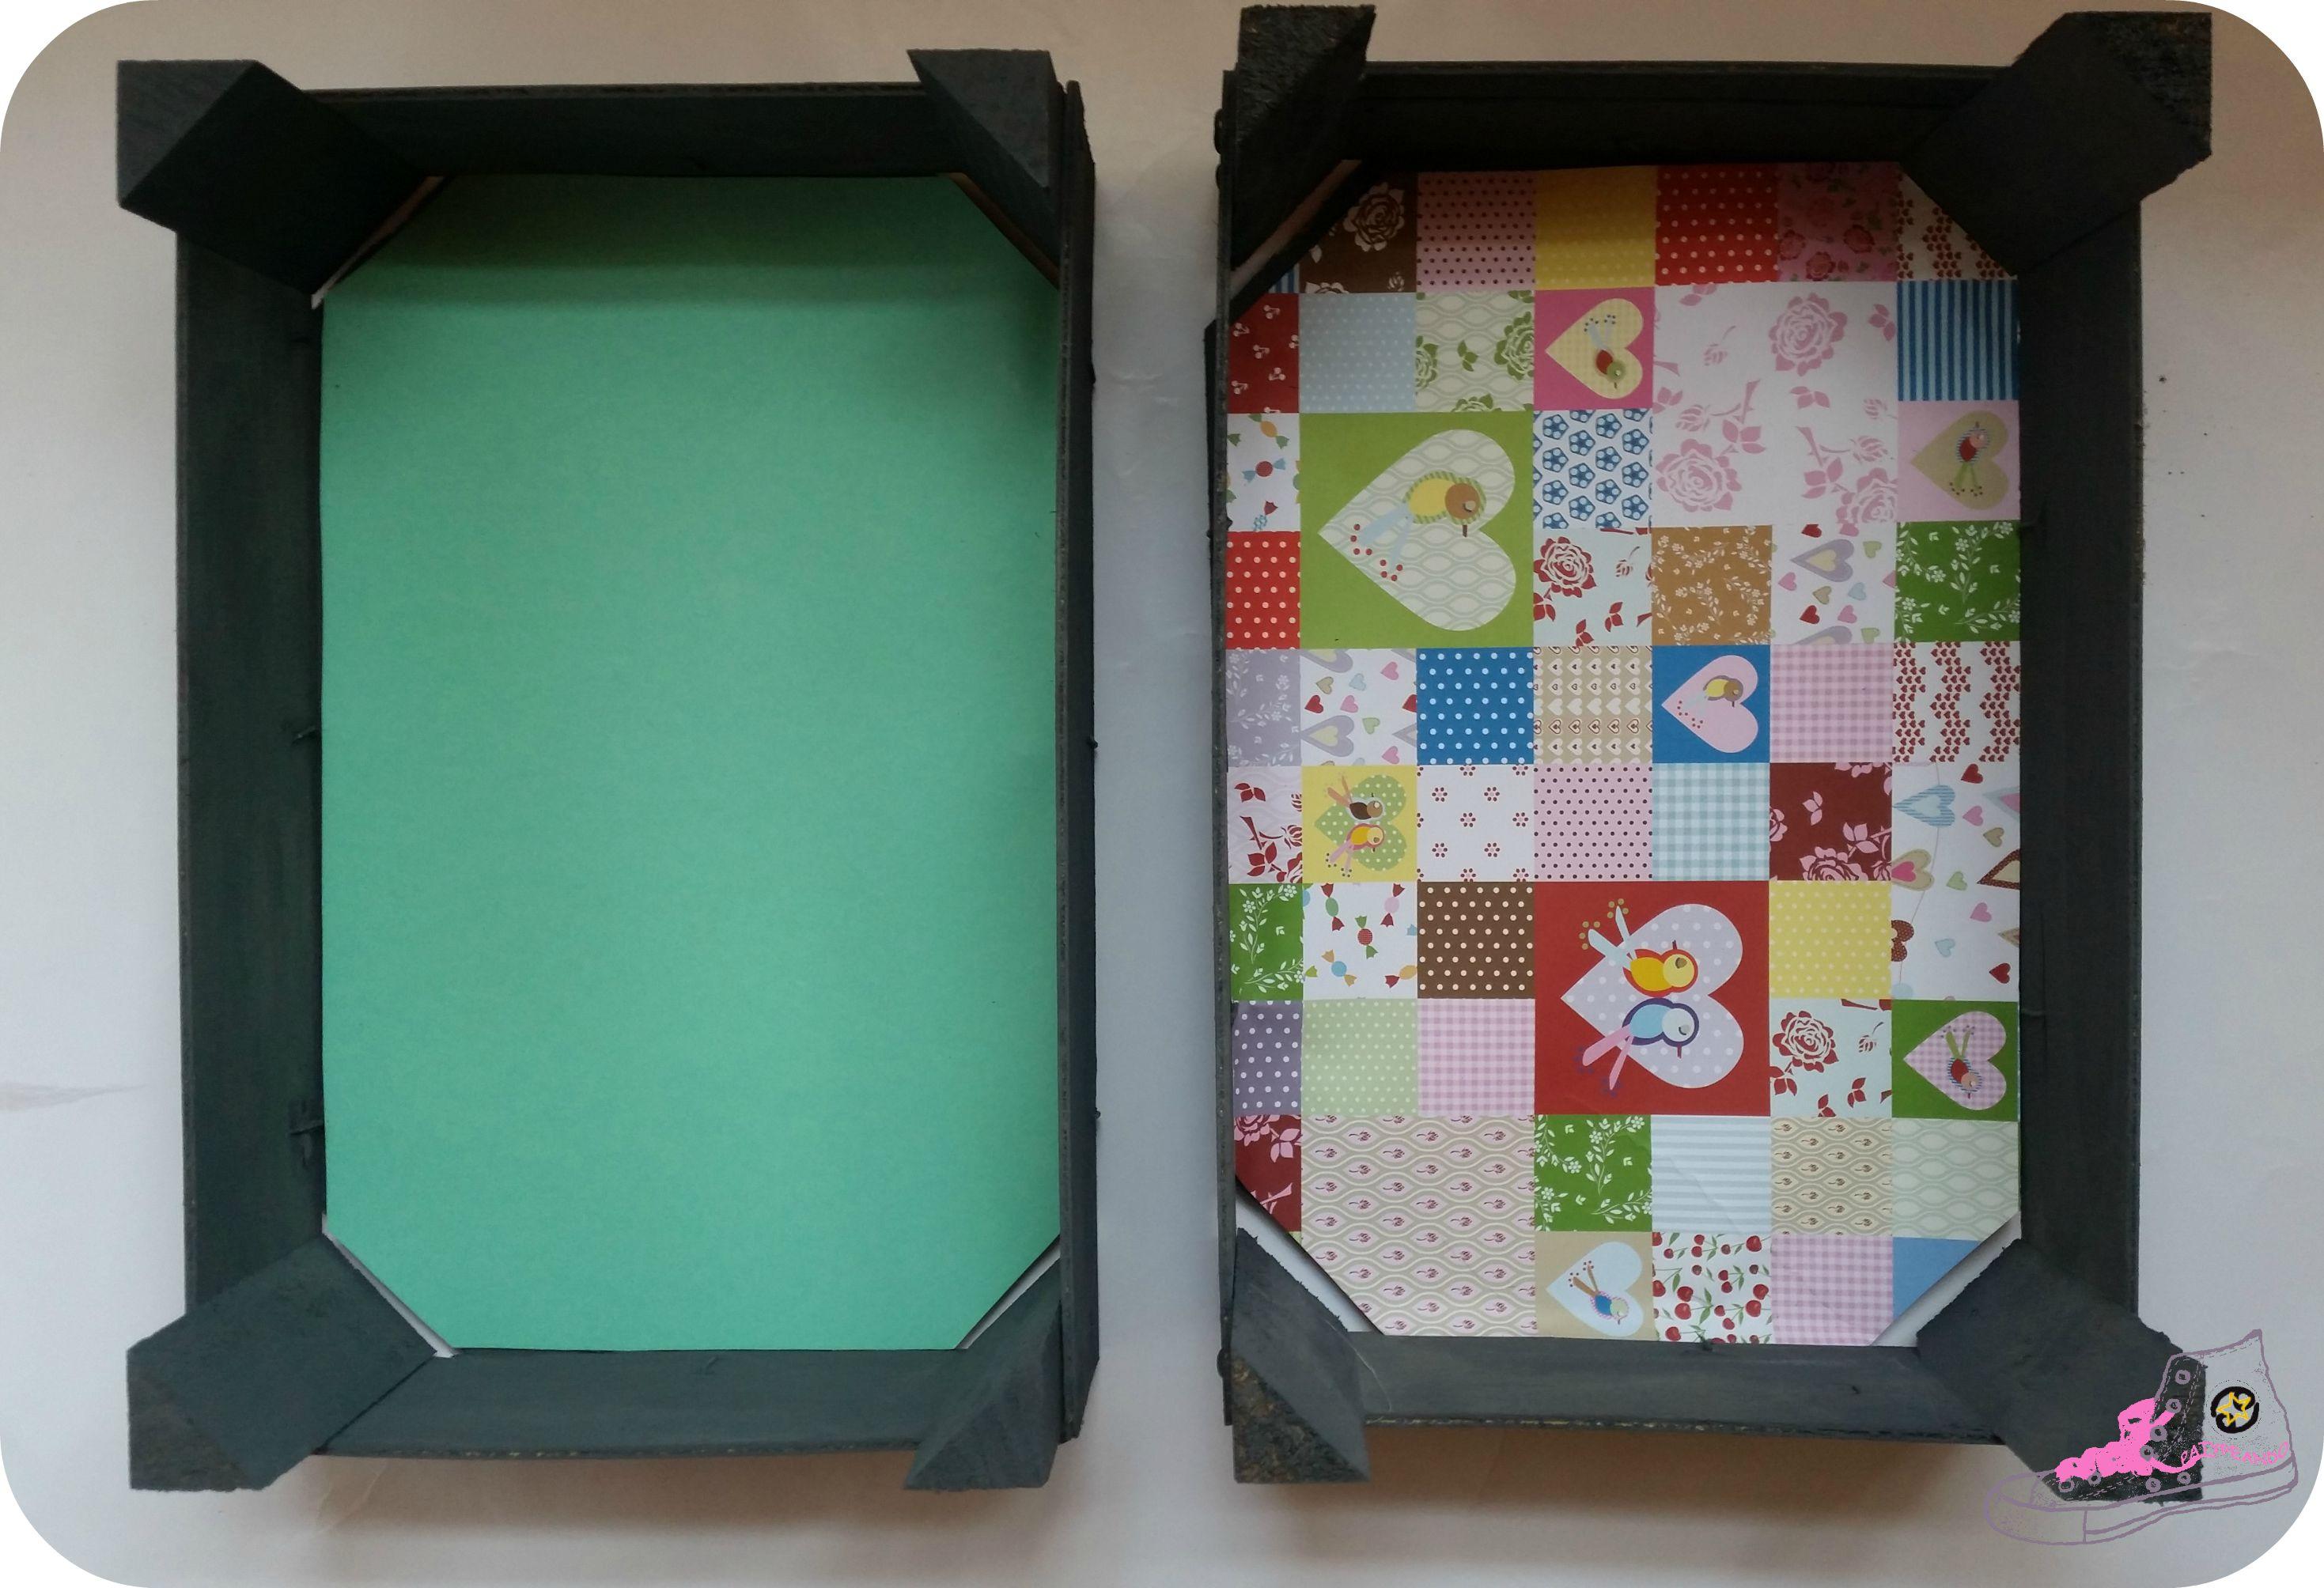 cajas de fresas 2